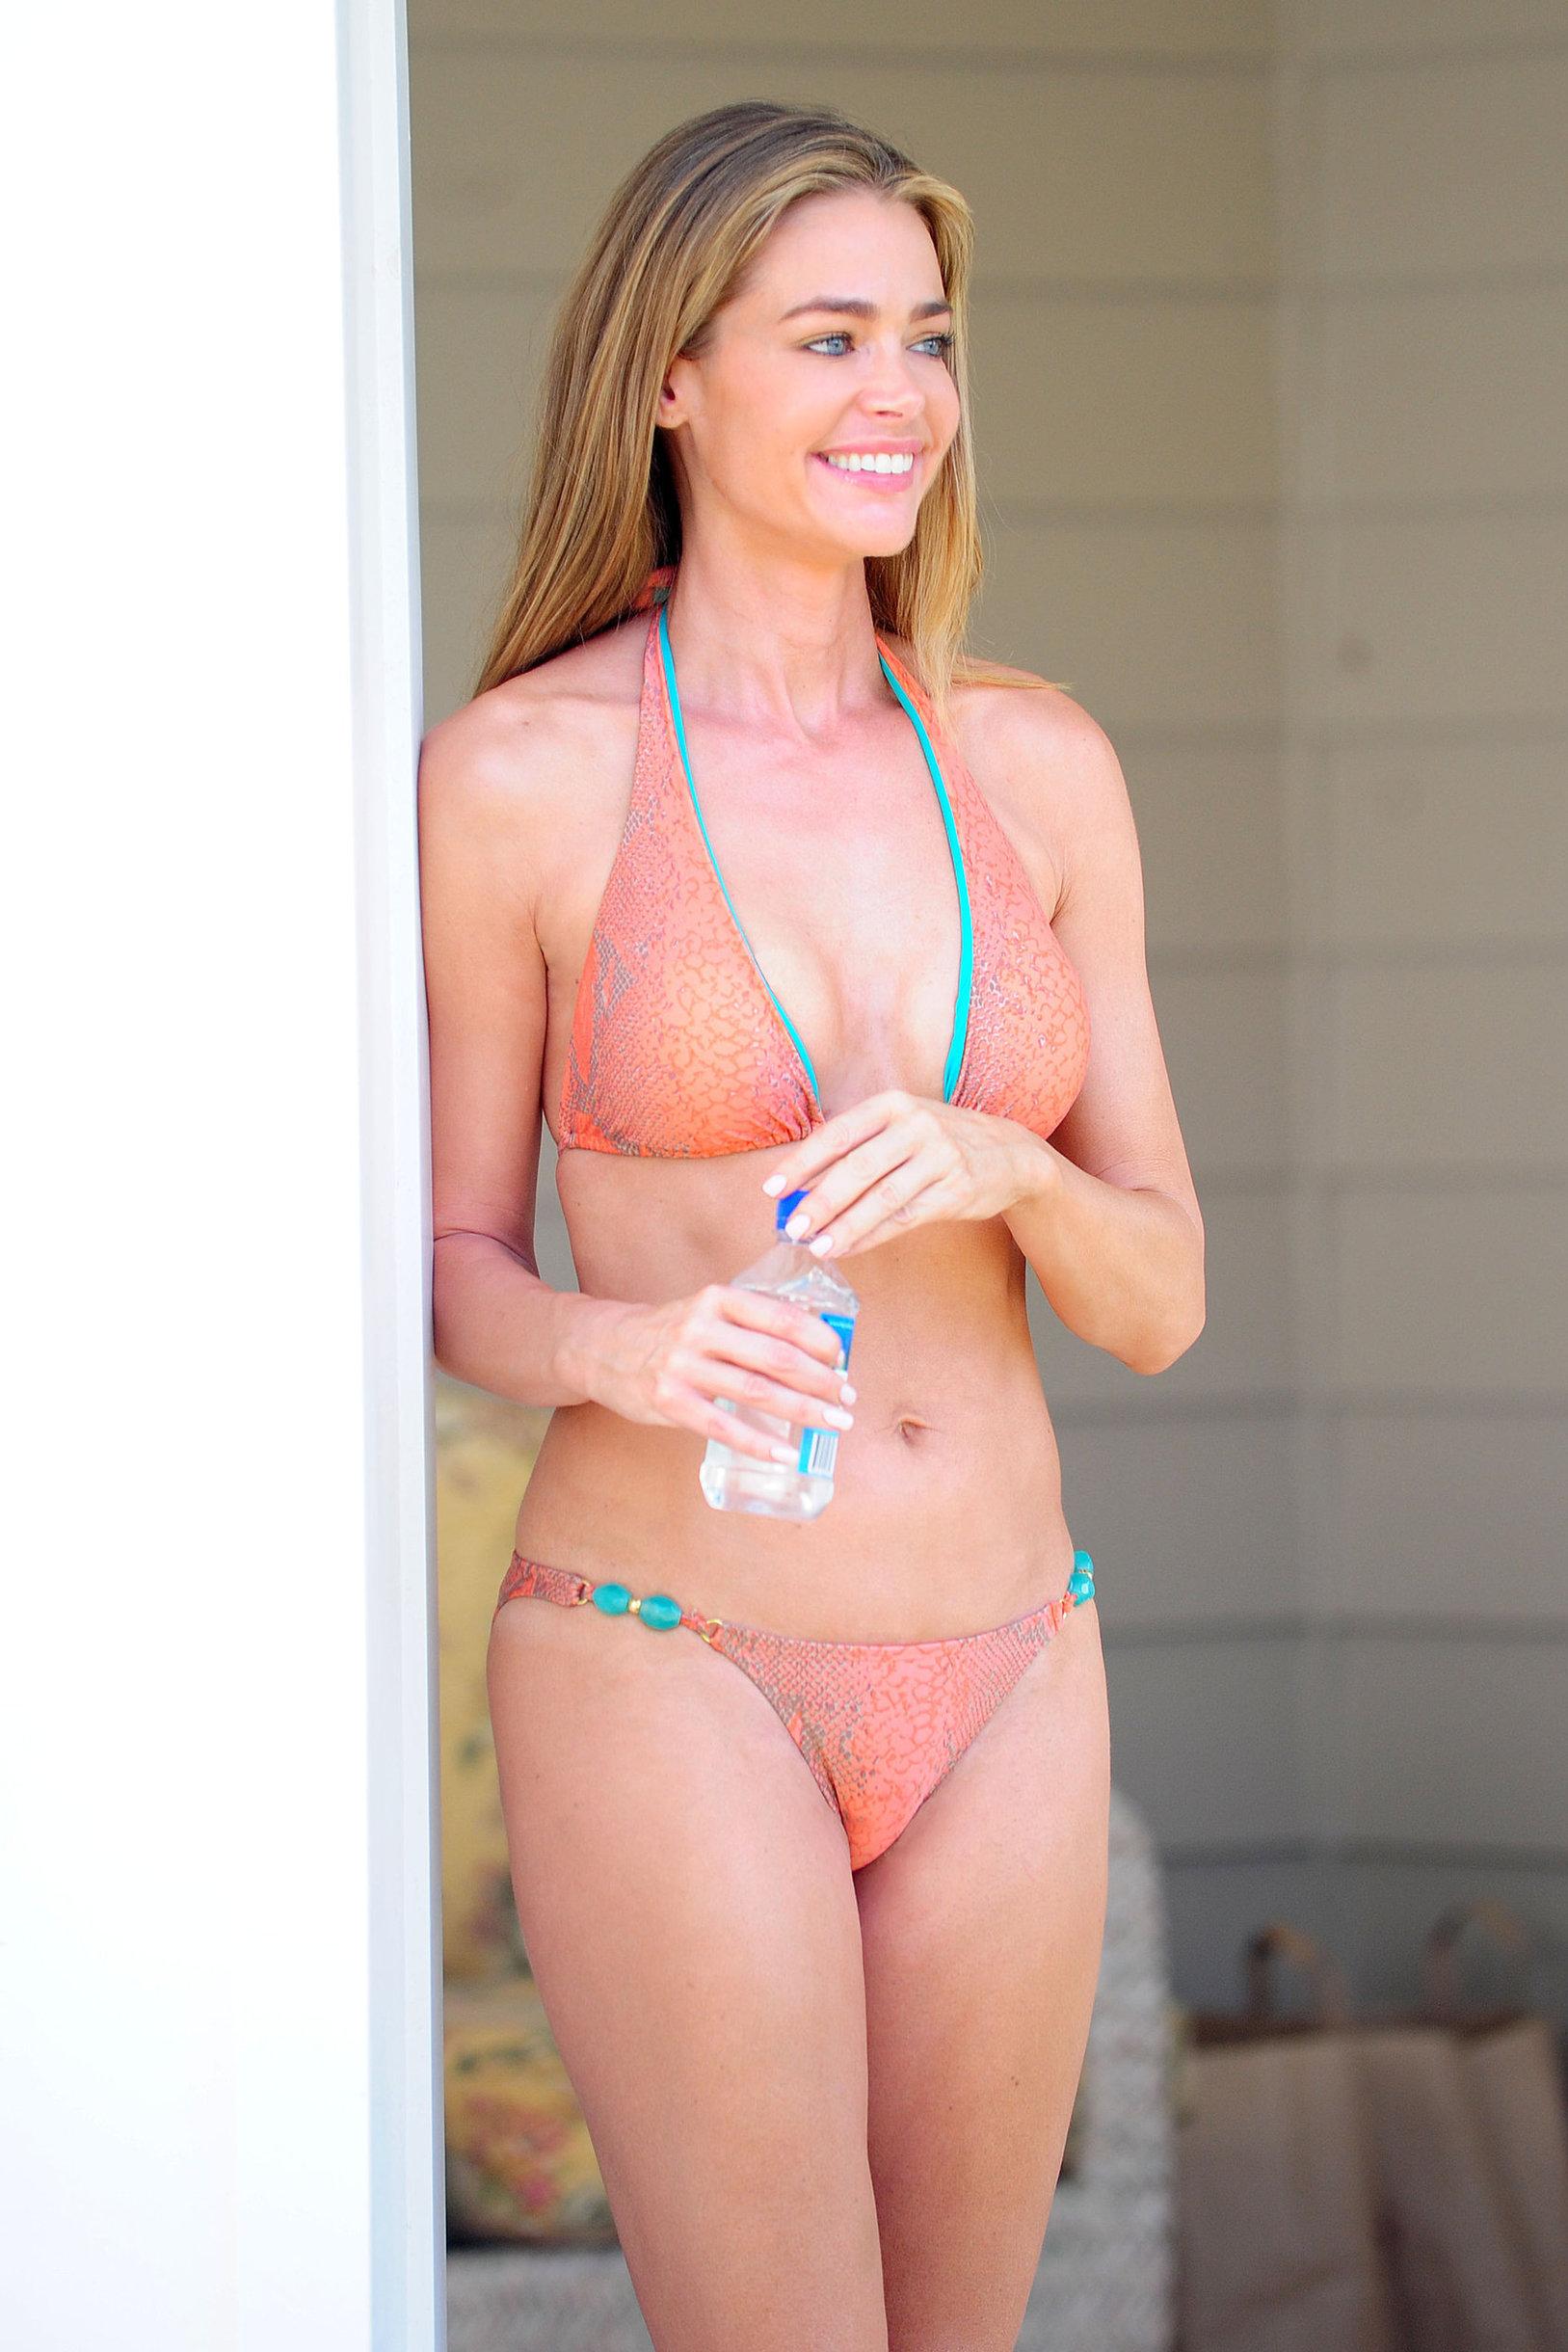 Bikini pictures denise richards